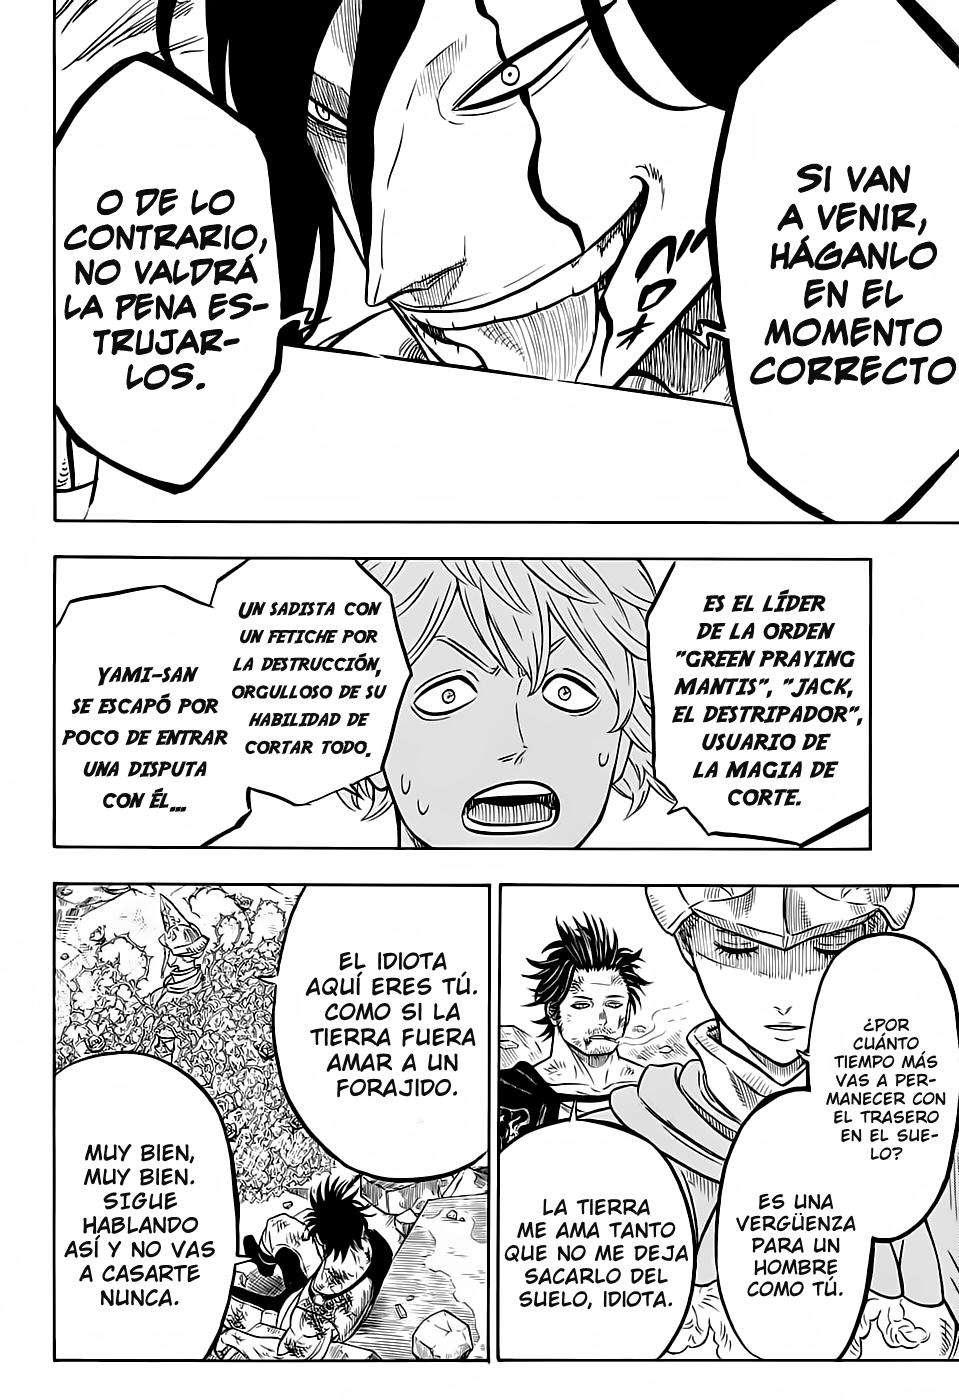 http://c5.ninemanga.com/es_manga/35/3811/449527/52ac909c791fd918500ce7e8fed79cf5.jpg Page 6